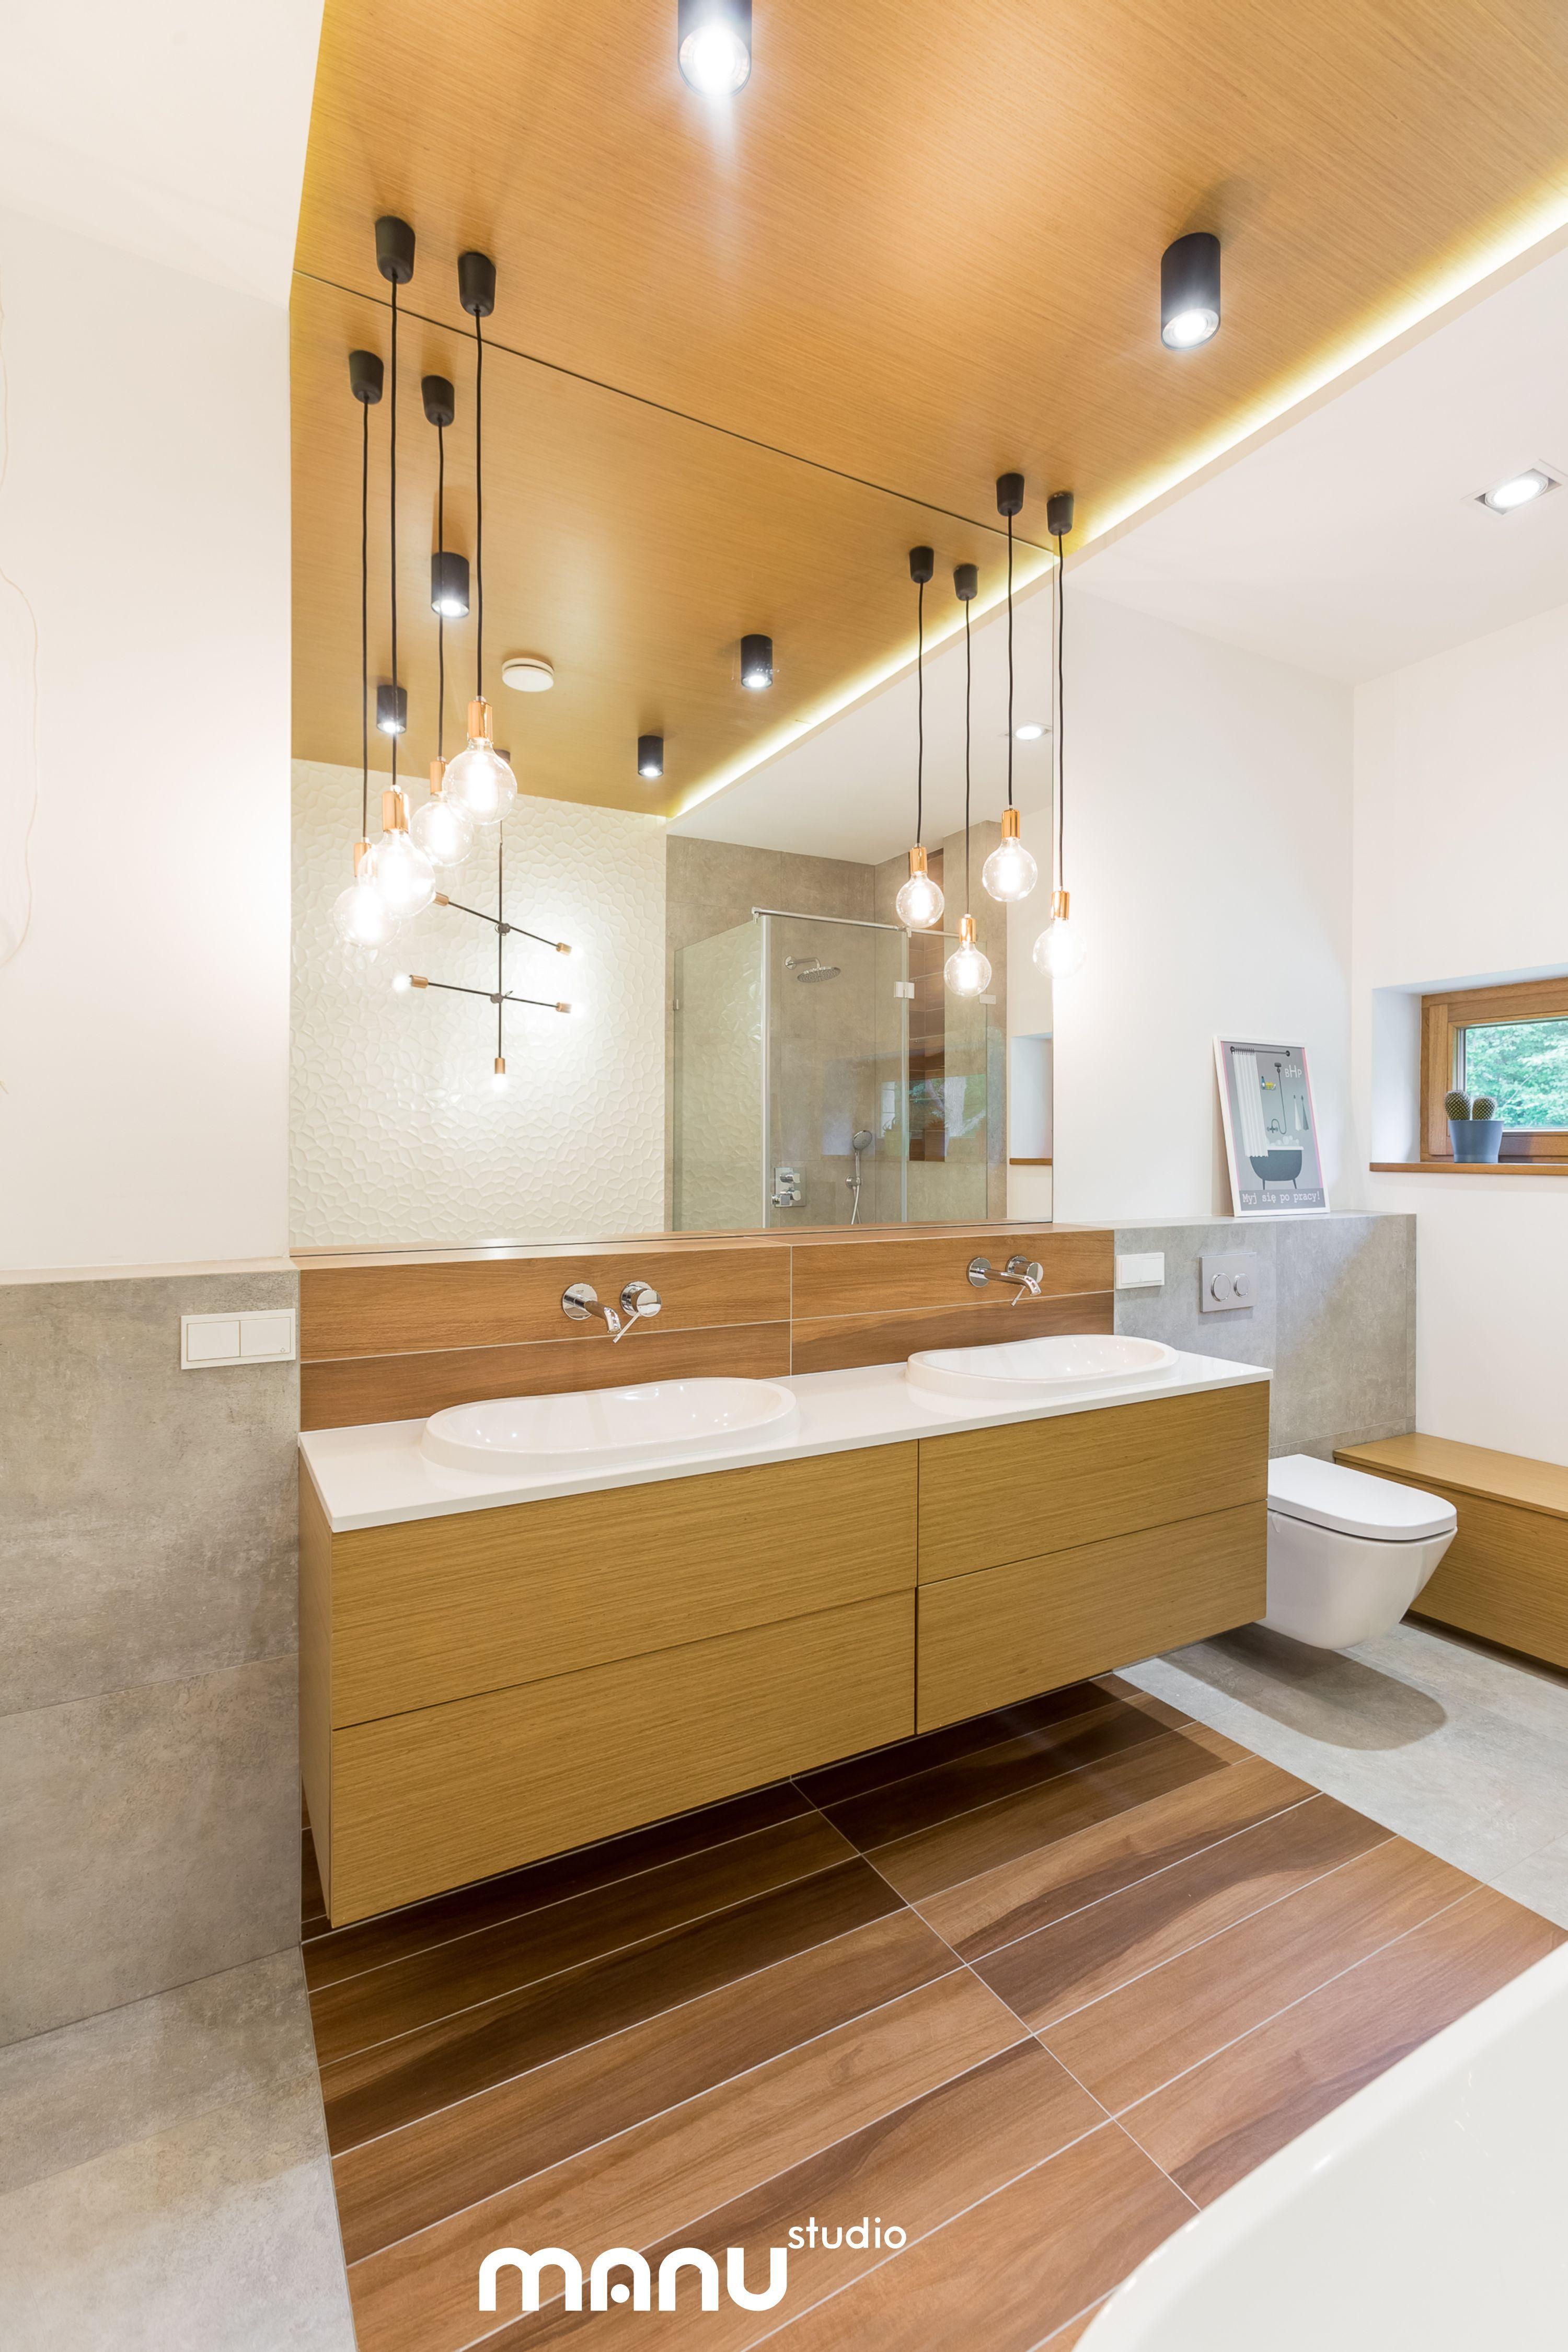 Wood In Bathroom By Manustudio Interiordesign